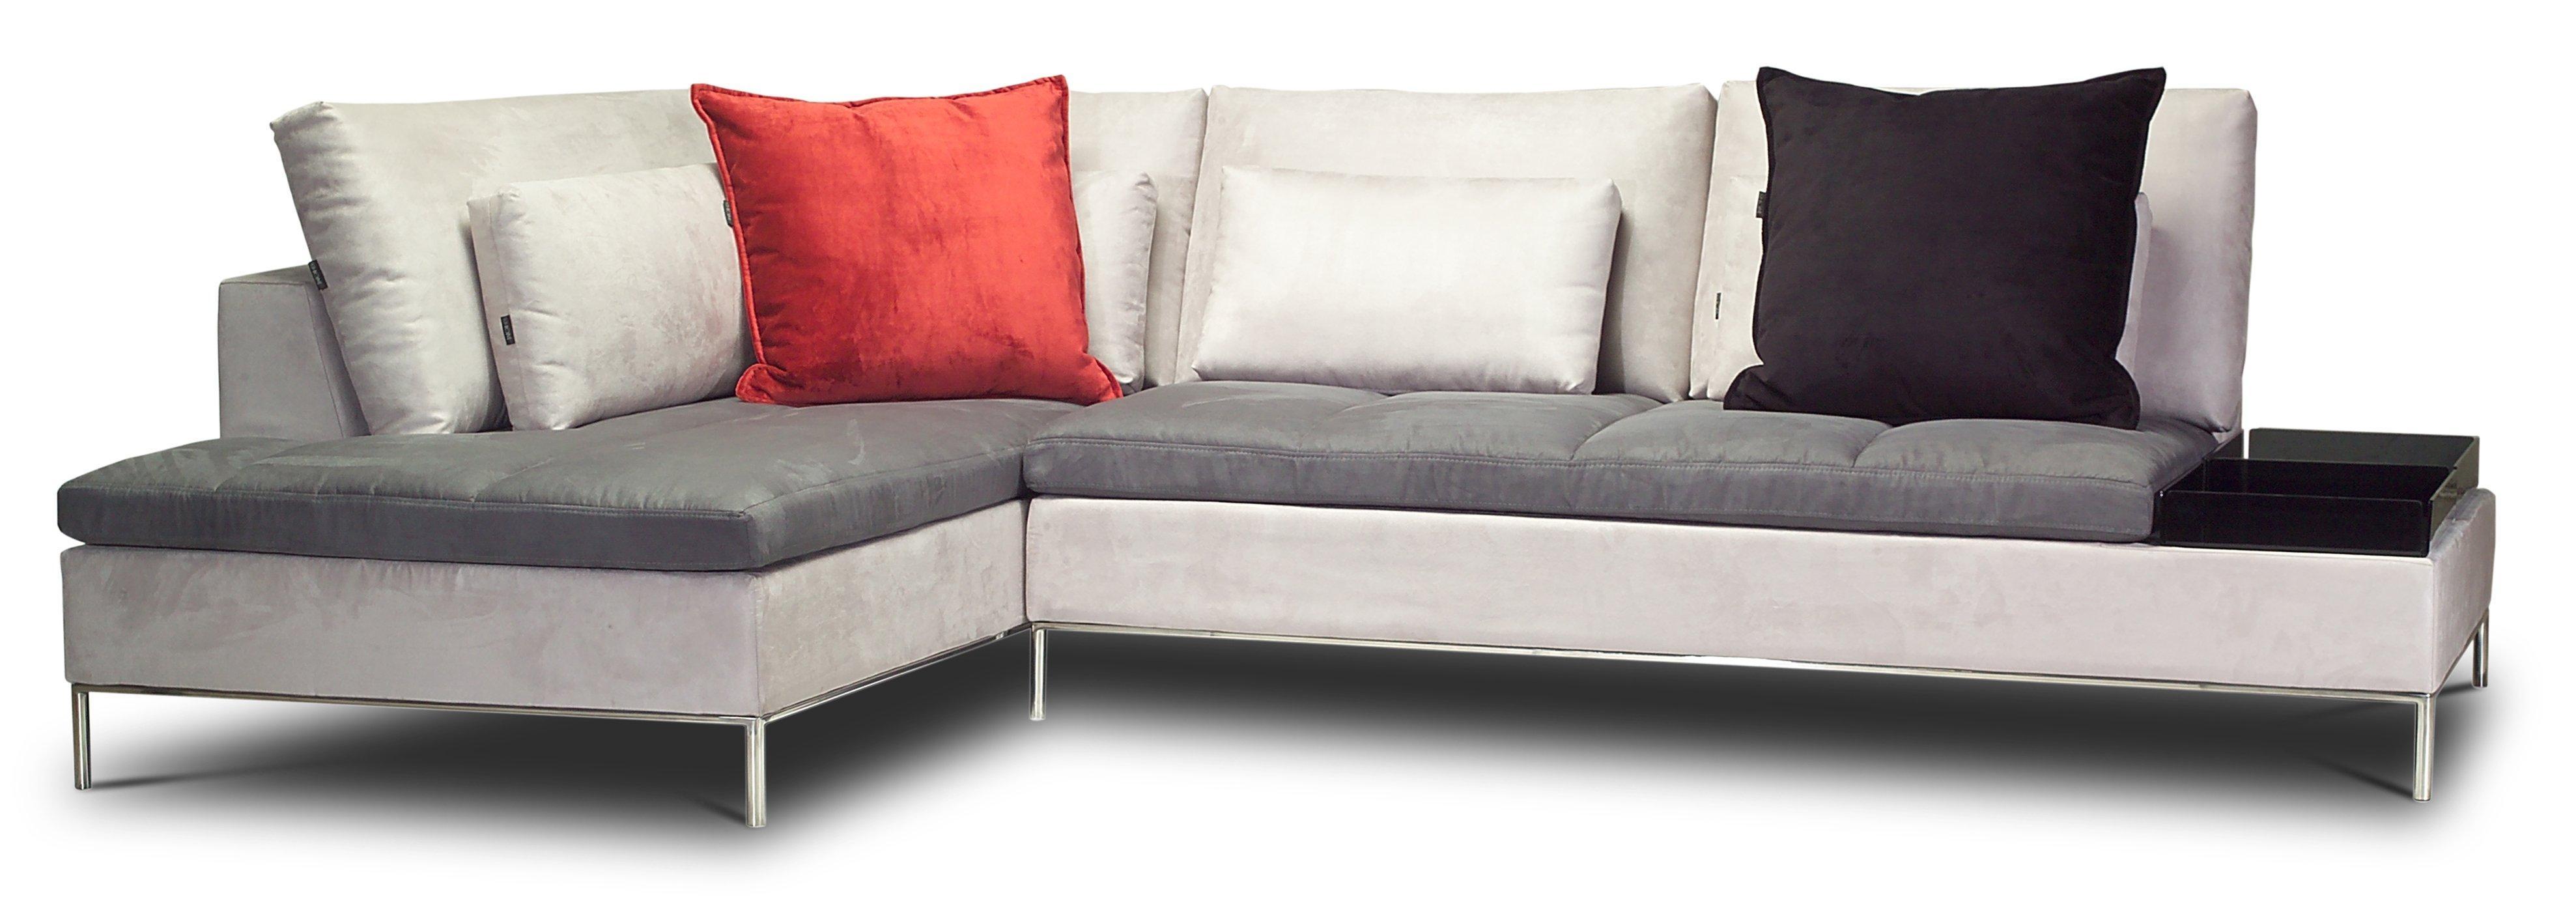 Sofa Bed Houston | Sofa Gallery | Kengire Intended For Modern Sofas Houston (Image 12 of 20)